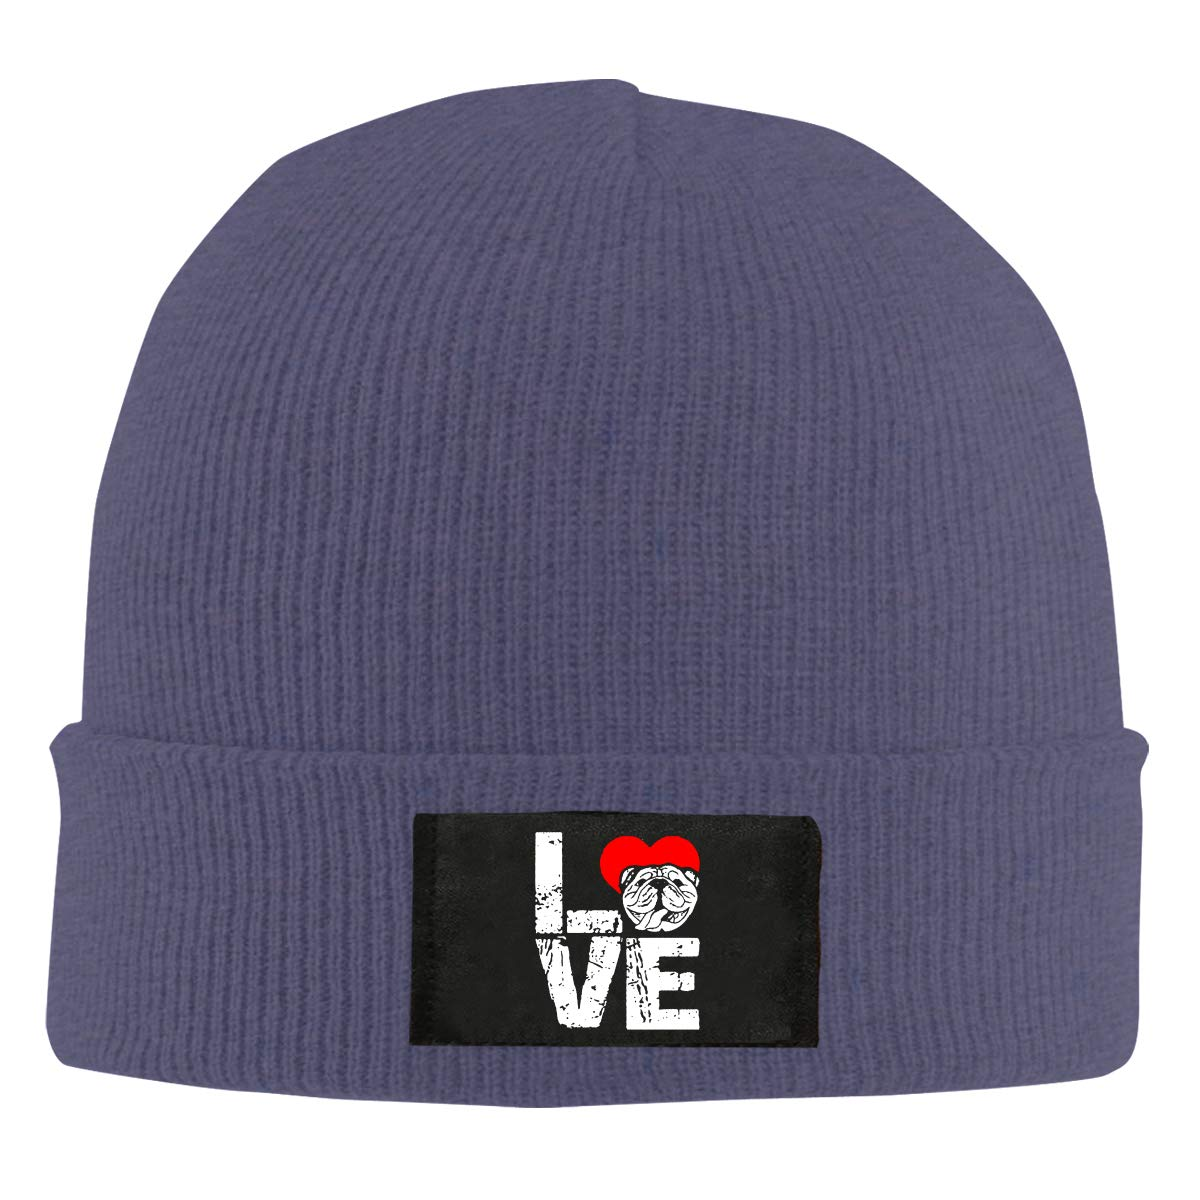 English Bulldog Lovers Unisex Warm Winter Hat Knit Beanie Skull Cap Cuff Beanie Hat Winter Hats